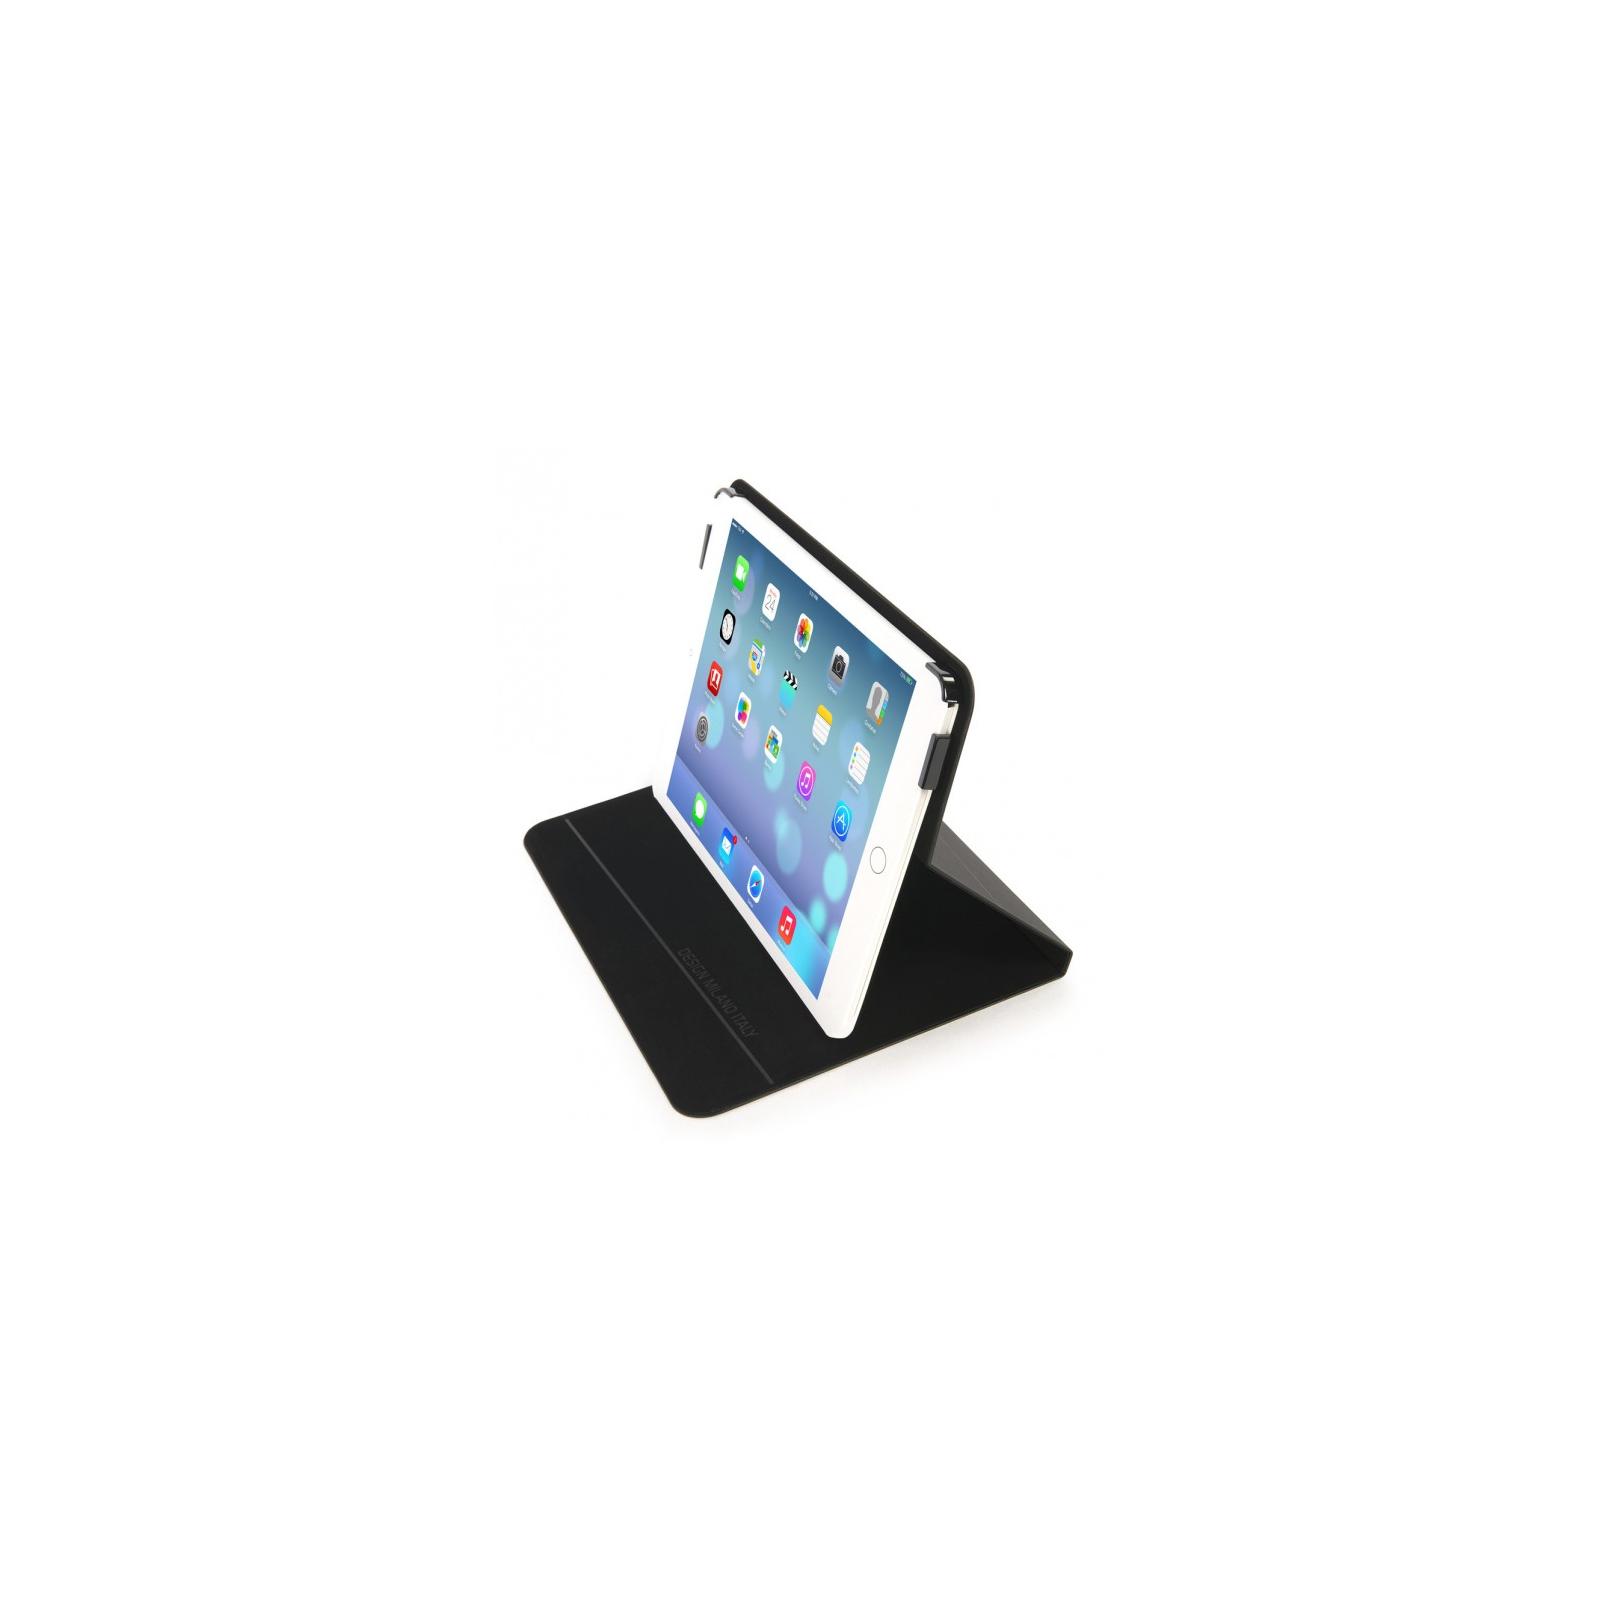 Чехол для планшета Tucano iPad Air Filo Black (IPD5FI) изображение 4